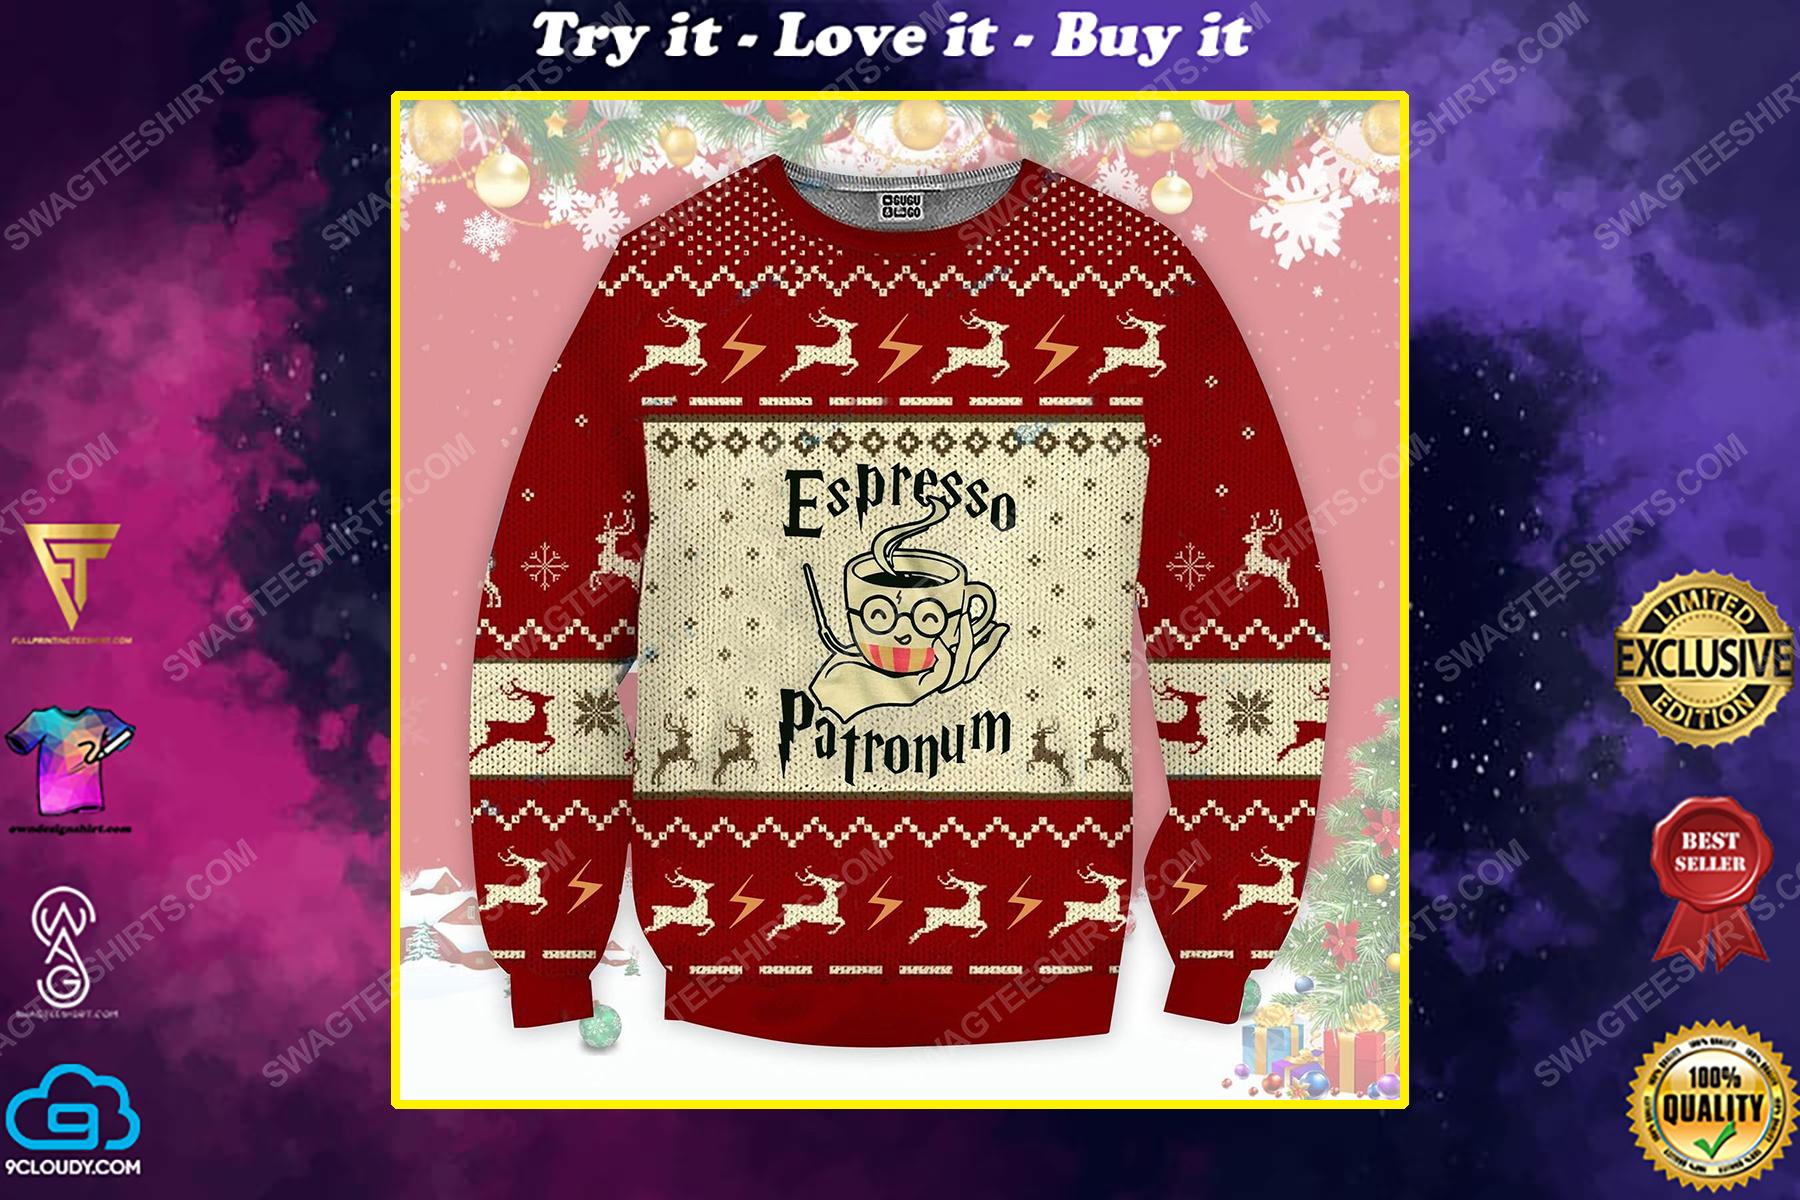 Espresso patronum magical coffee mug harry potter ugly christmas sweater 1